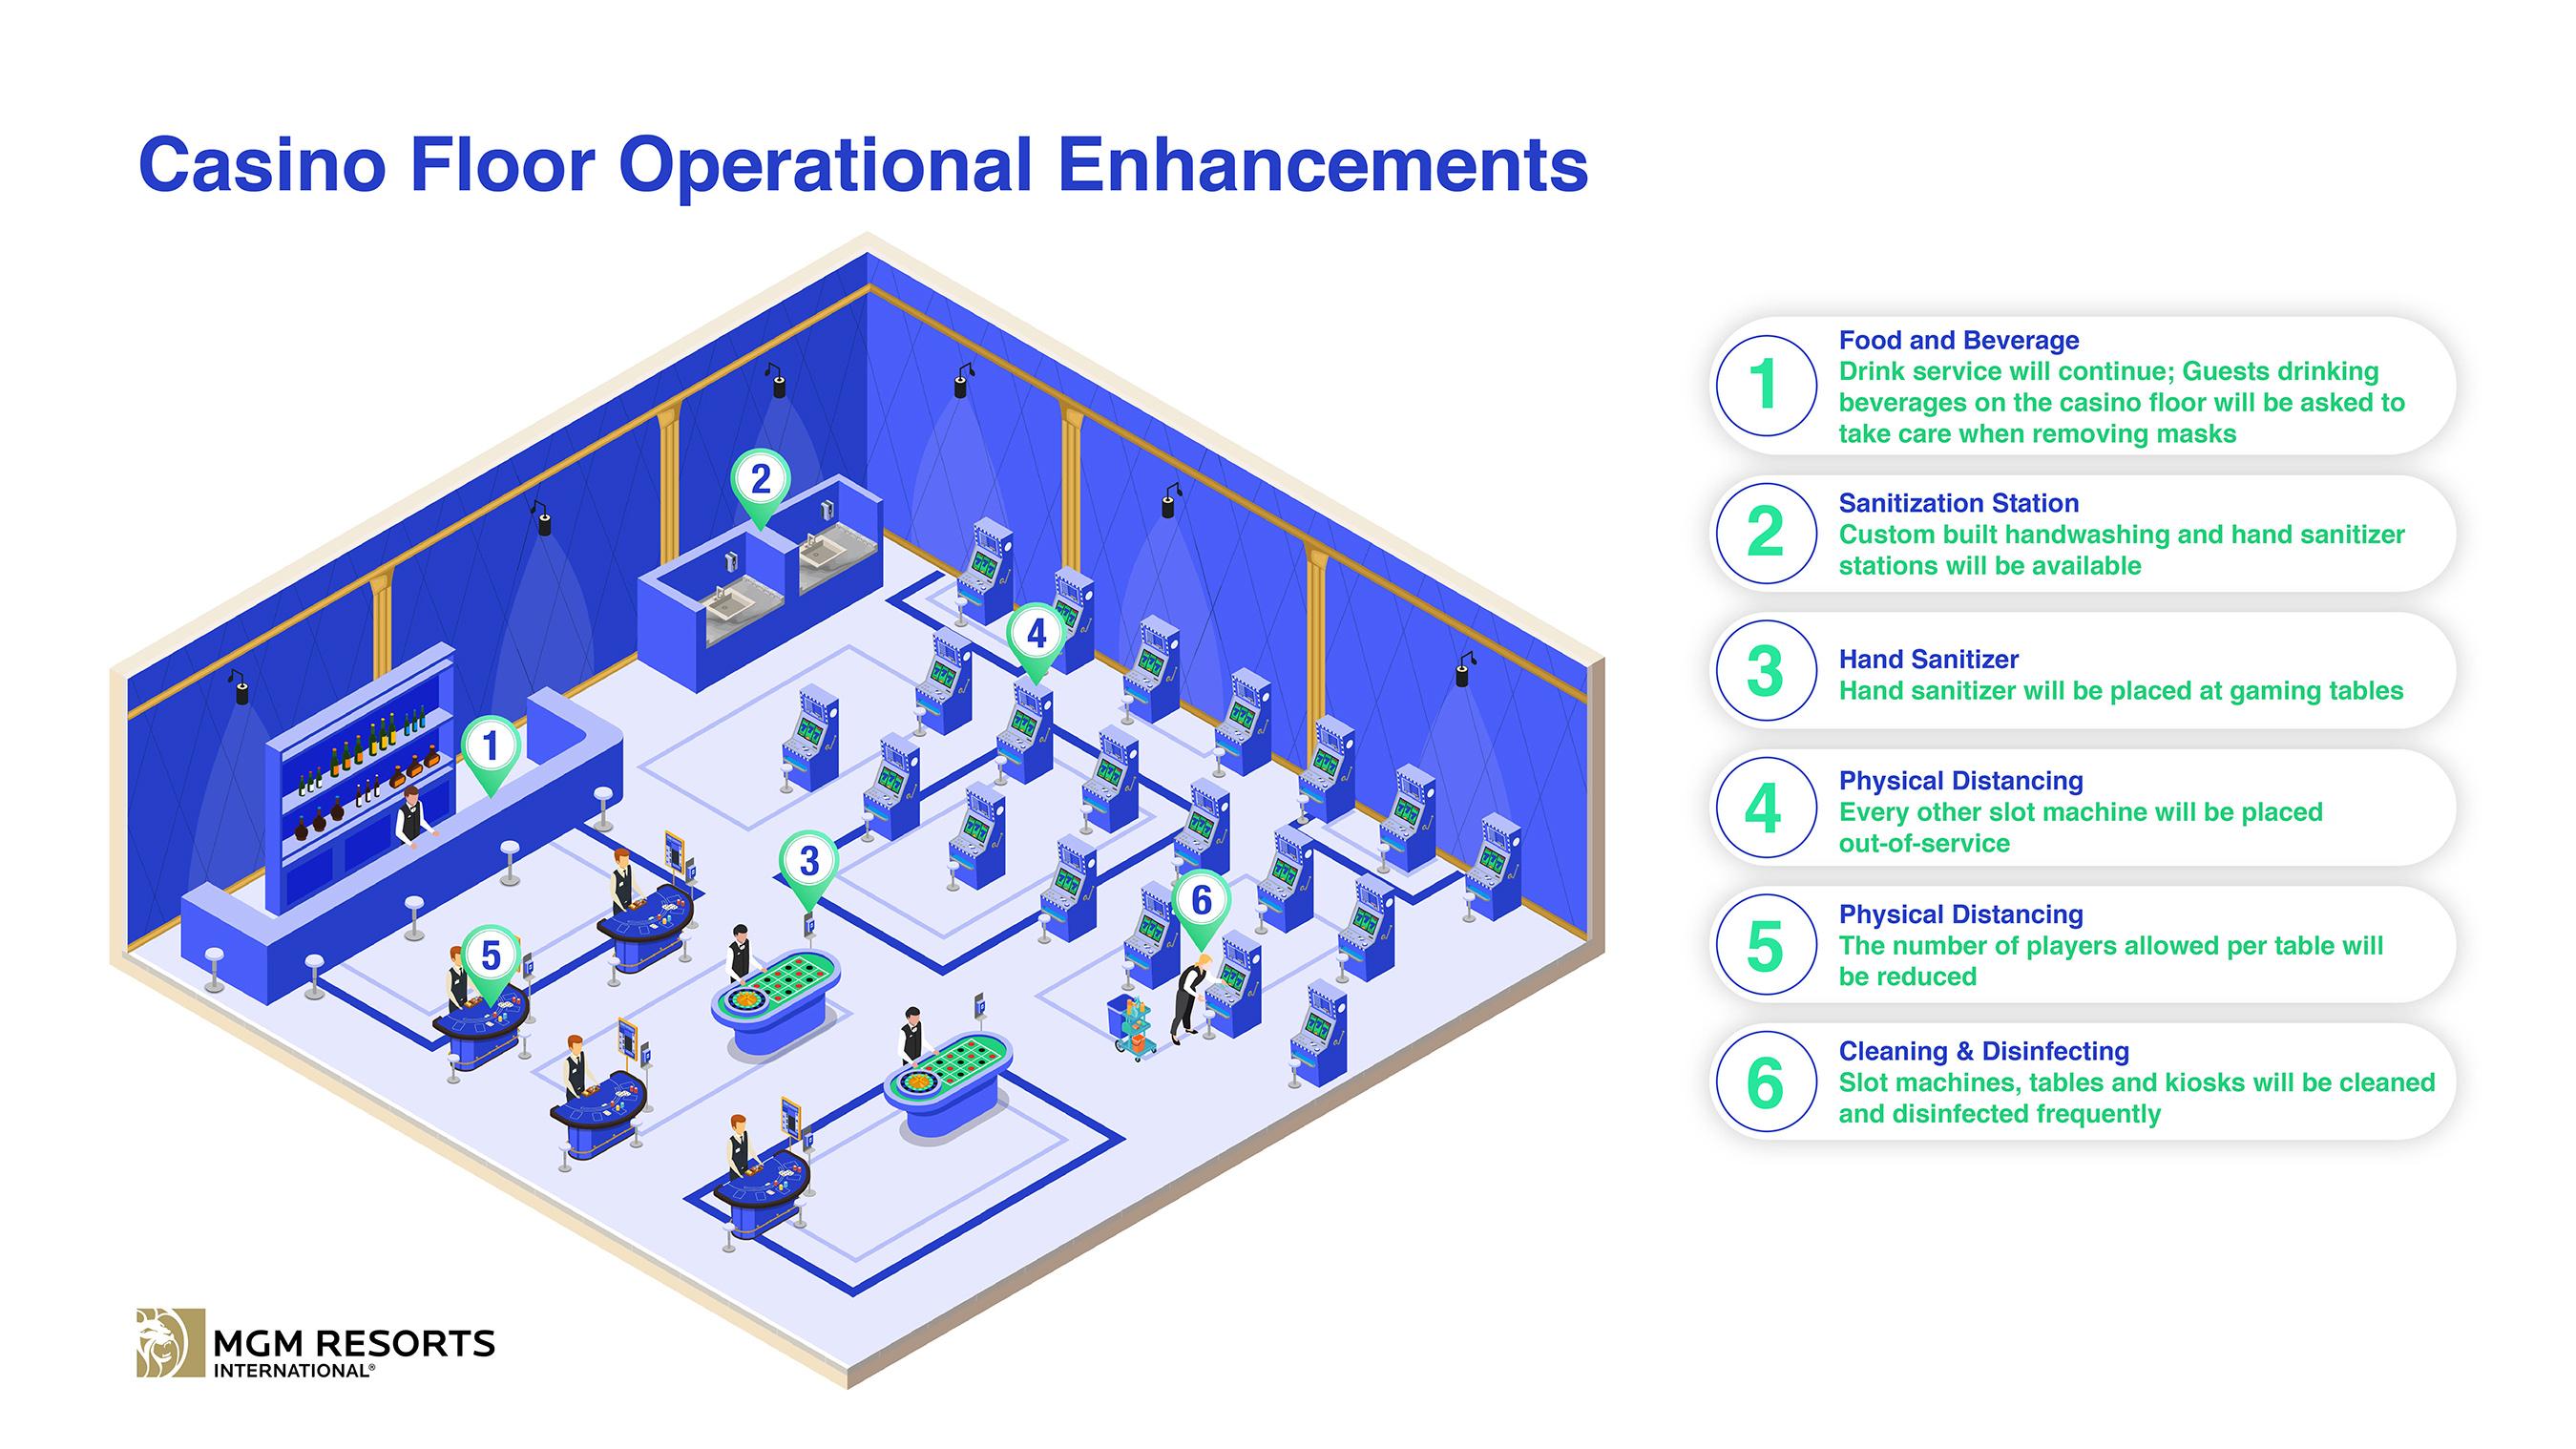 Casino Floor Operational Enhancements